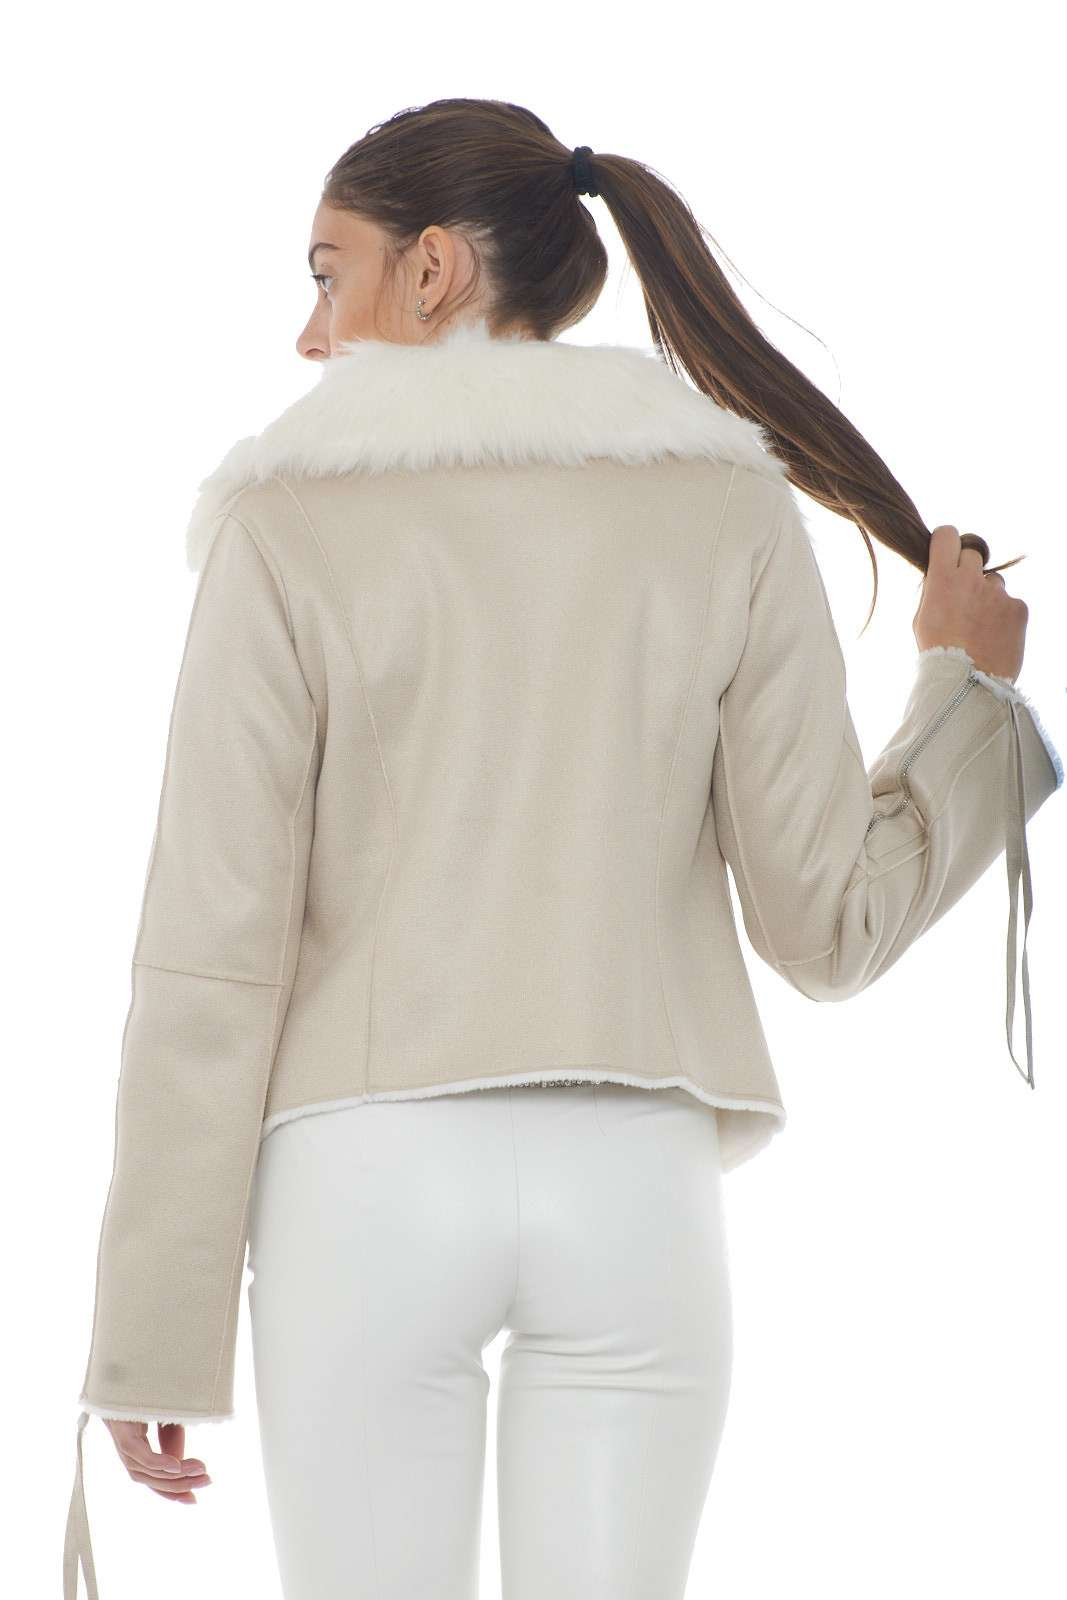 https://www.parmax.com/media/catalog/product/a/i/AI-outlet_parmax-giacca-donna-Patrizia-Pepe-2l0847-C.jpg